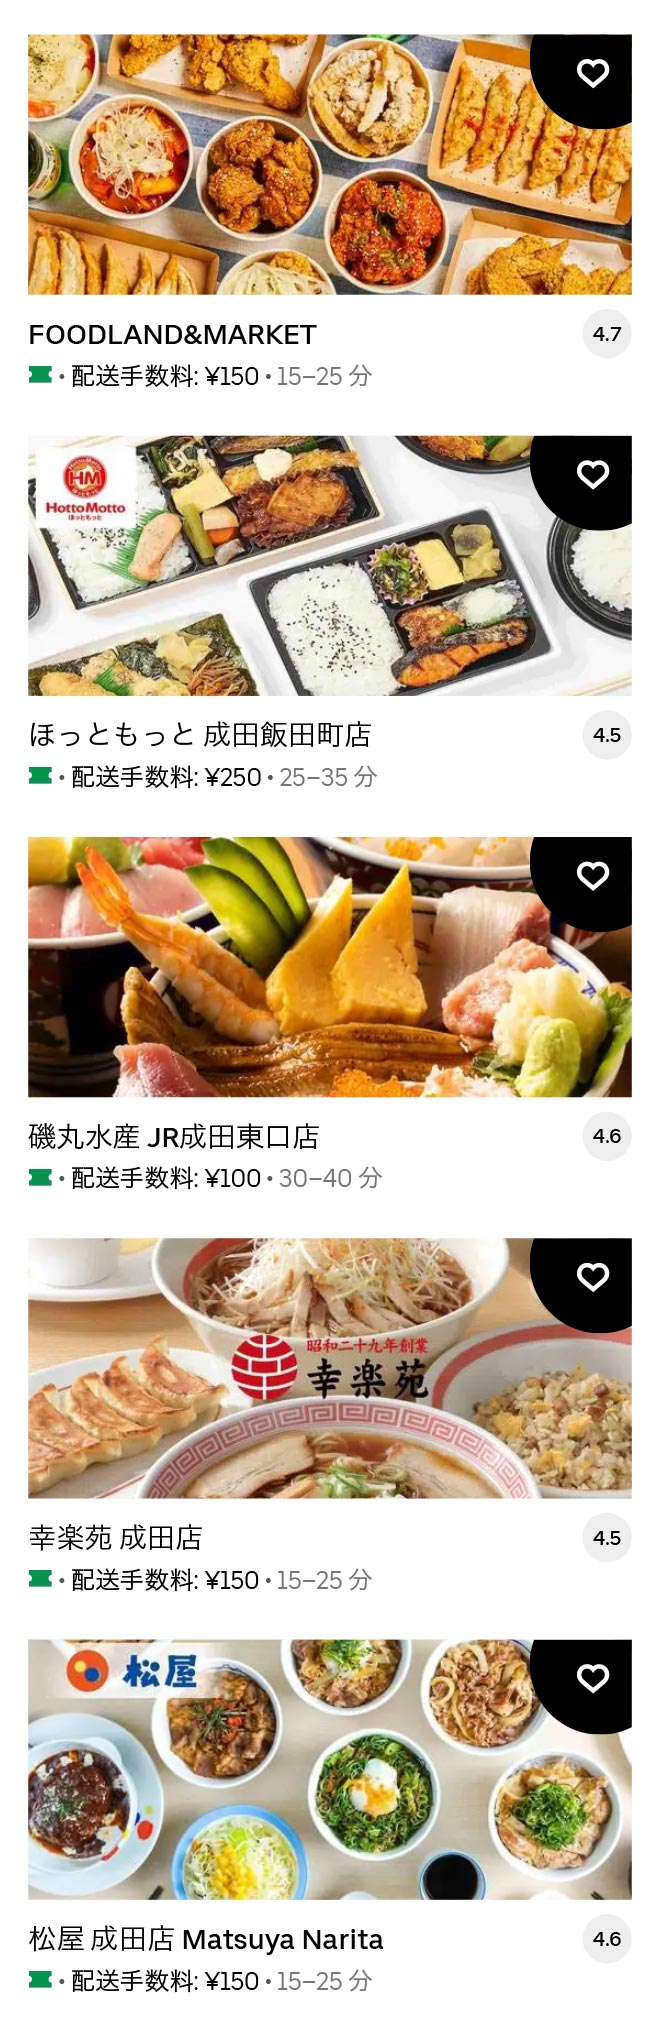 U narita menu 2104 02